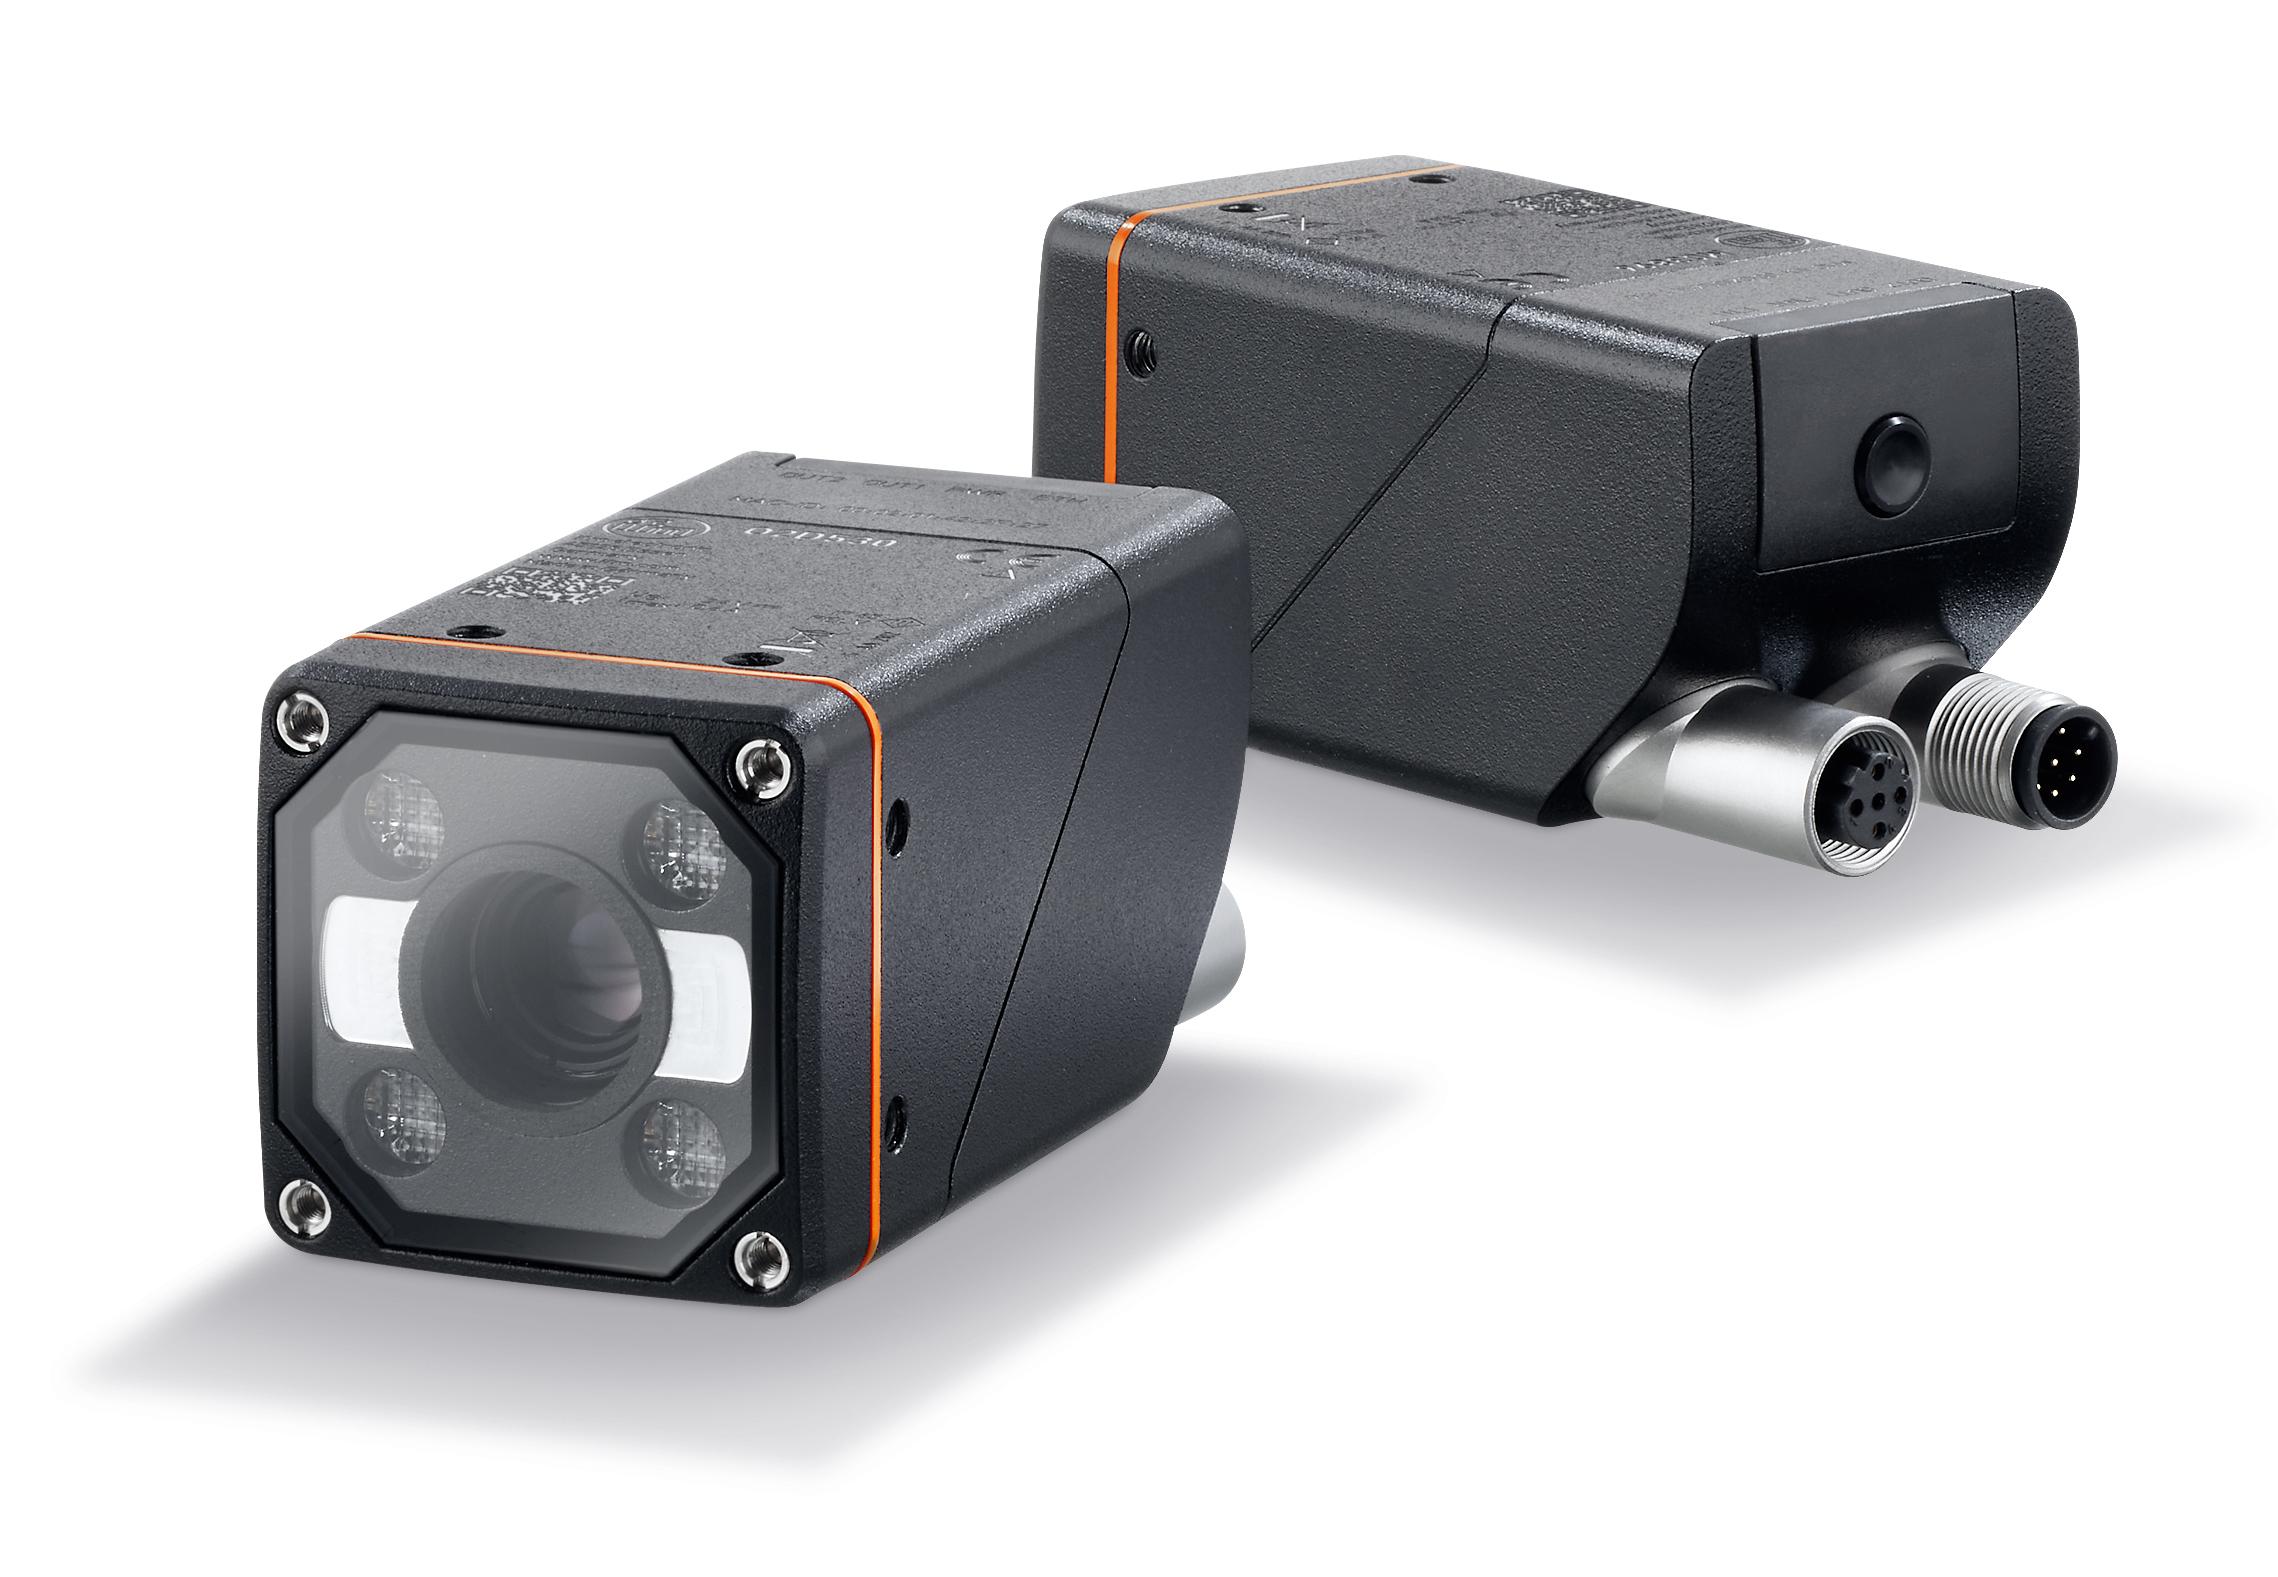 Vereinfachte Vision-Sensor-Parametrierung